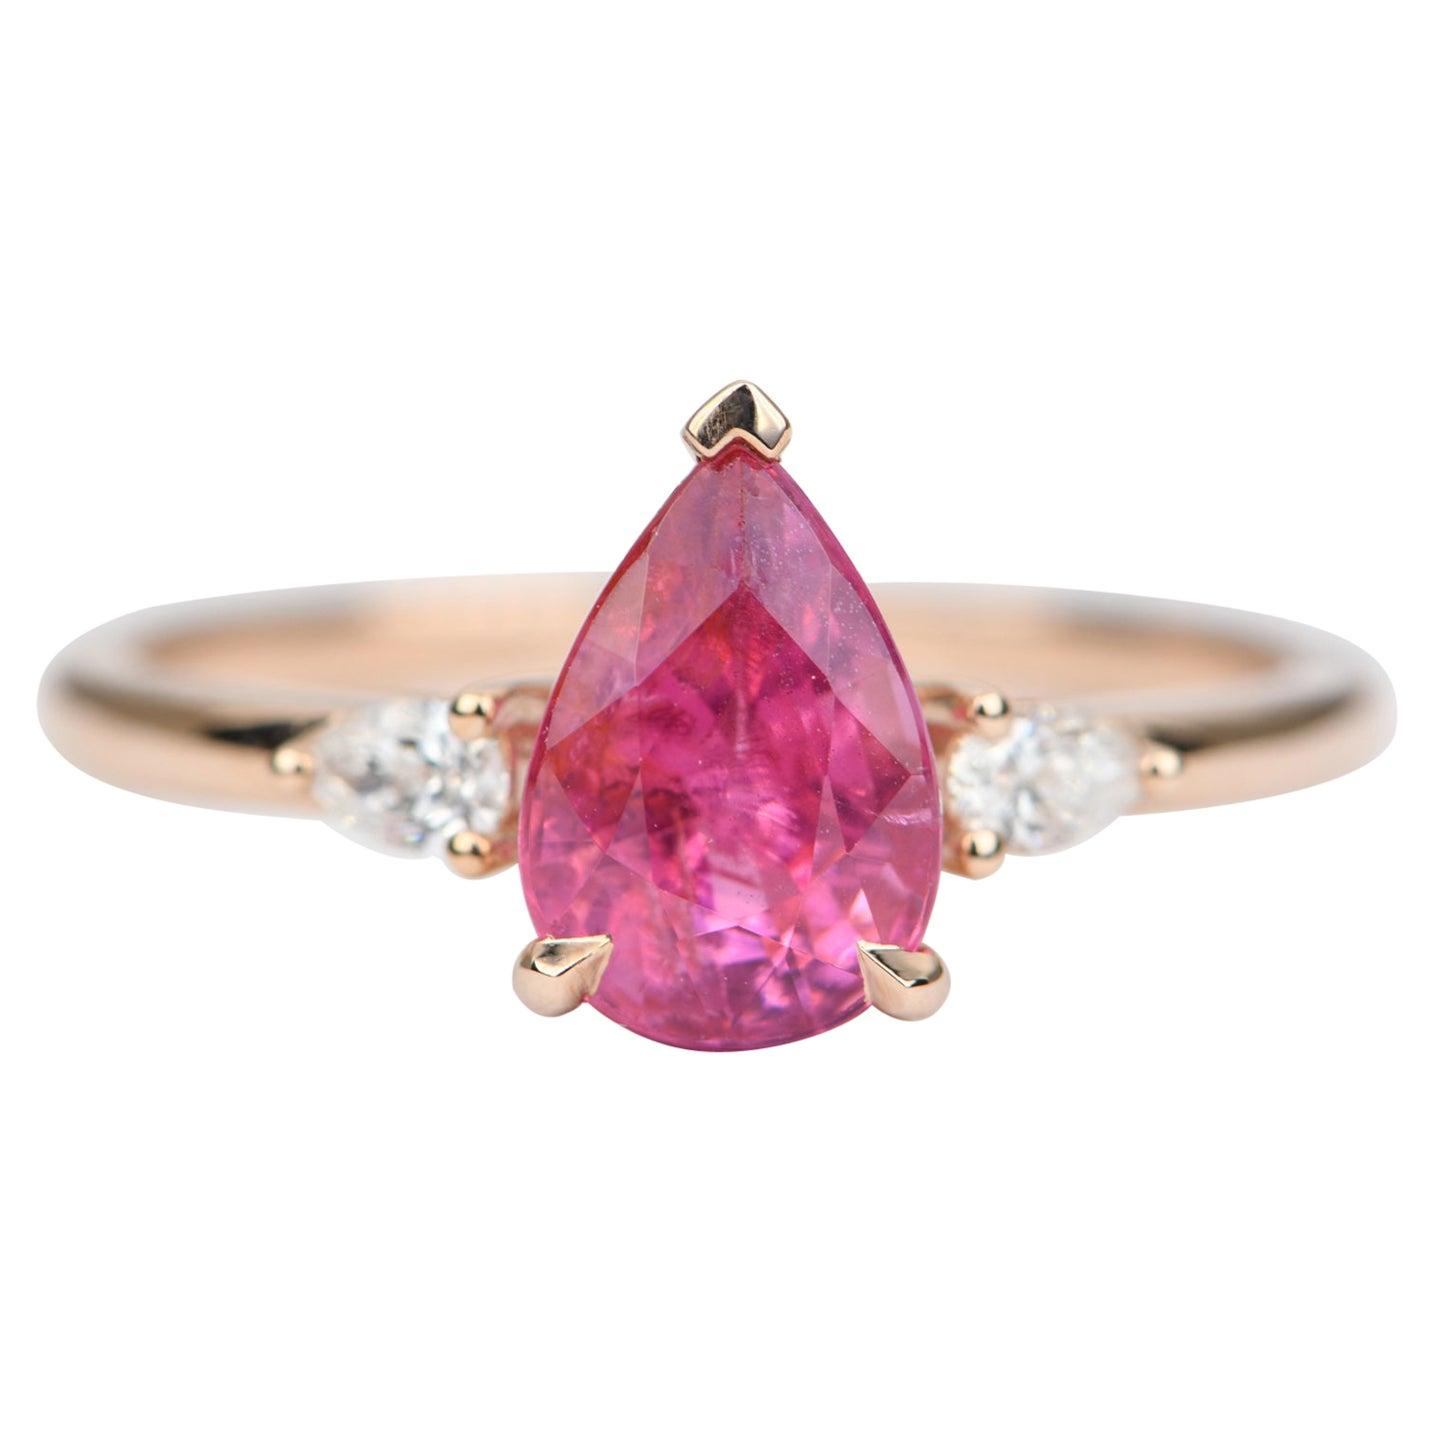 1.82ct Pear Shape Mahenge Spinel Diamond Sides Engagement Ring 14k Gold AD1895-1